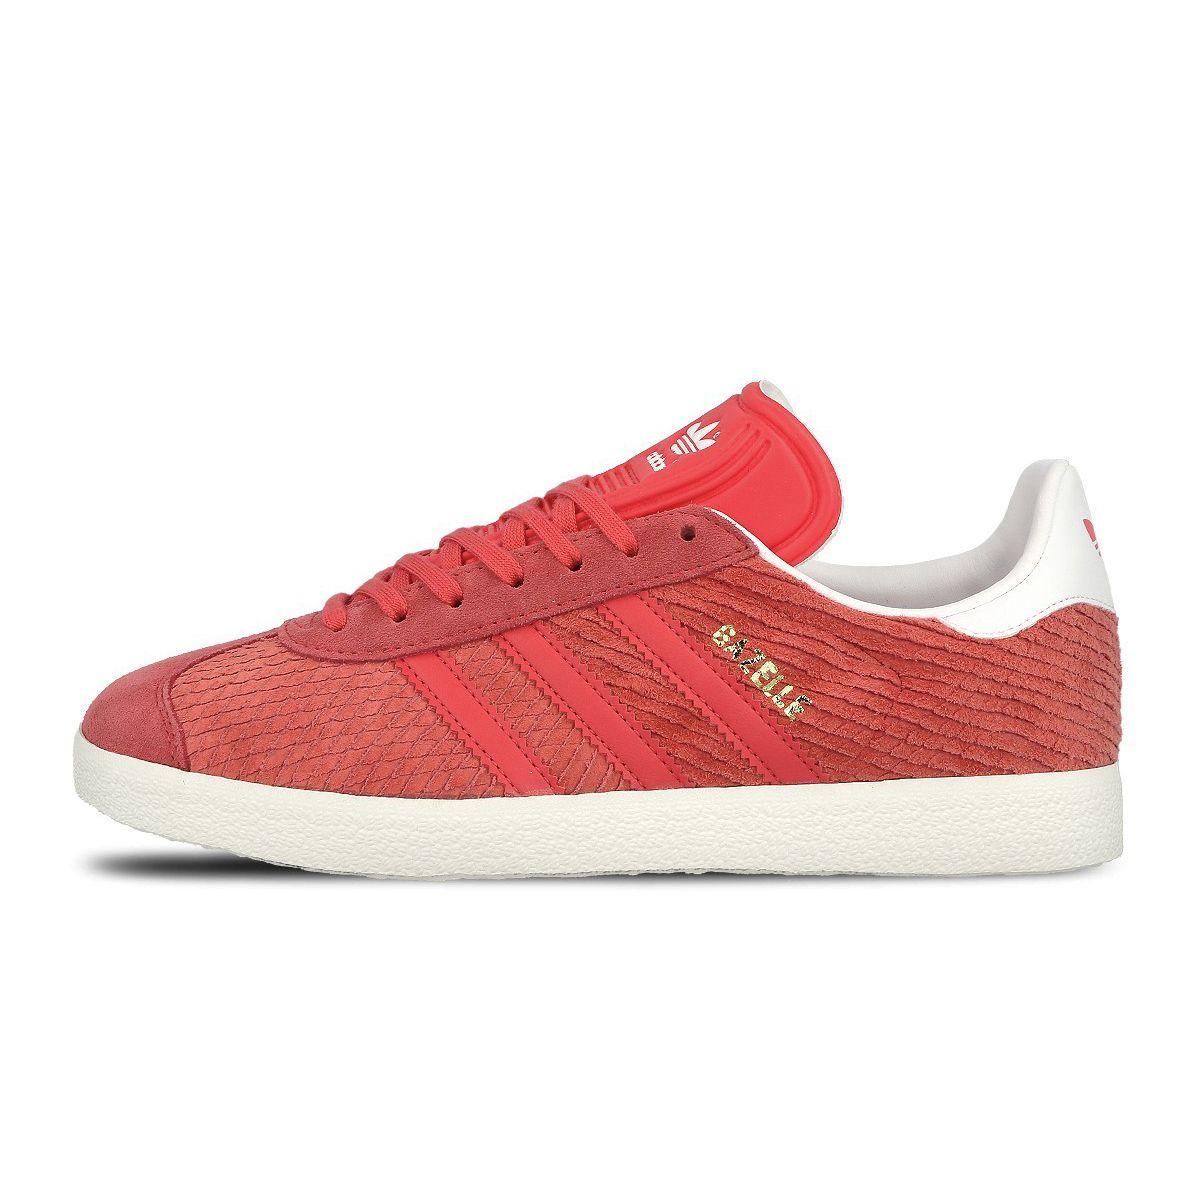 ADIDAS Patike GAZELLE W Adidas sneakers, Sneakers, Adidas